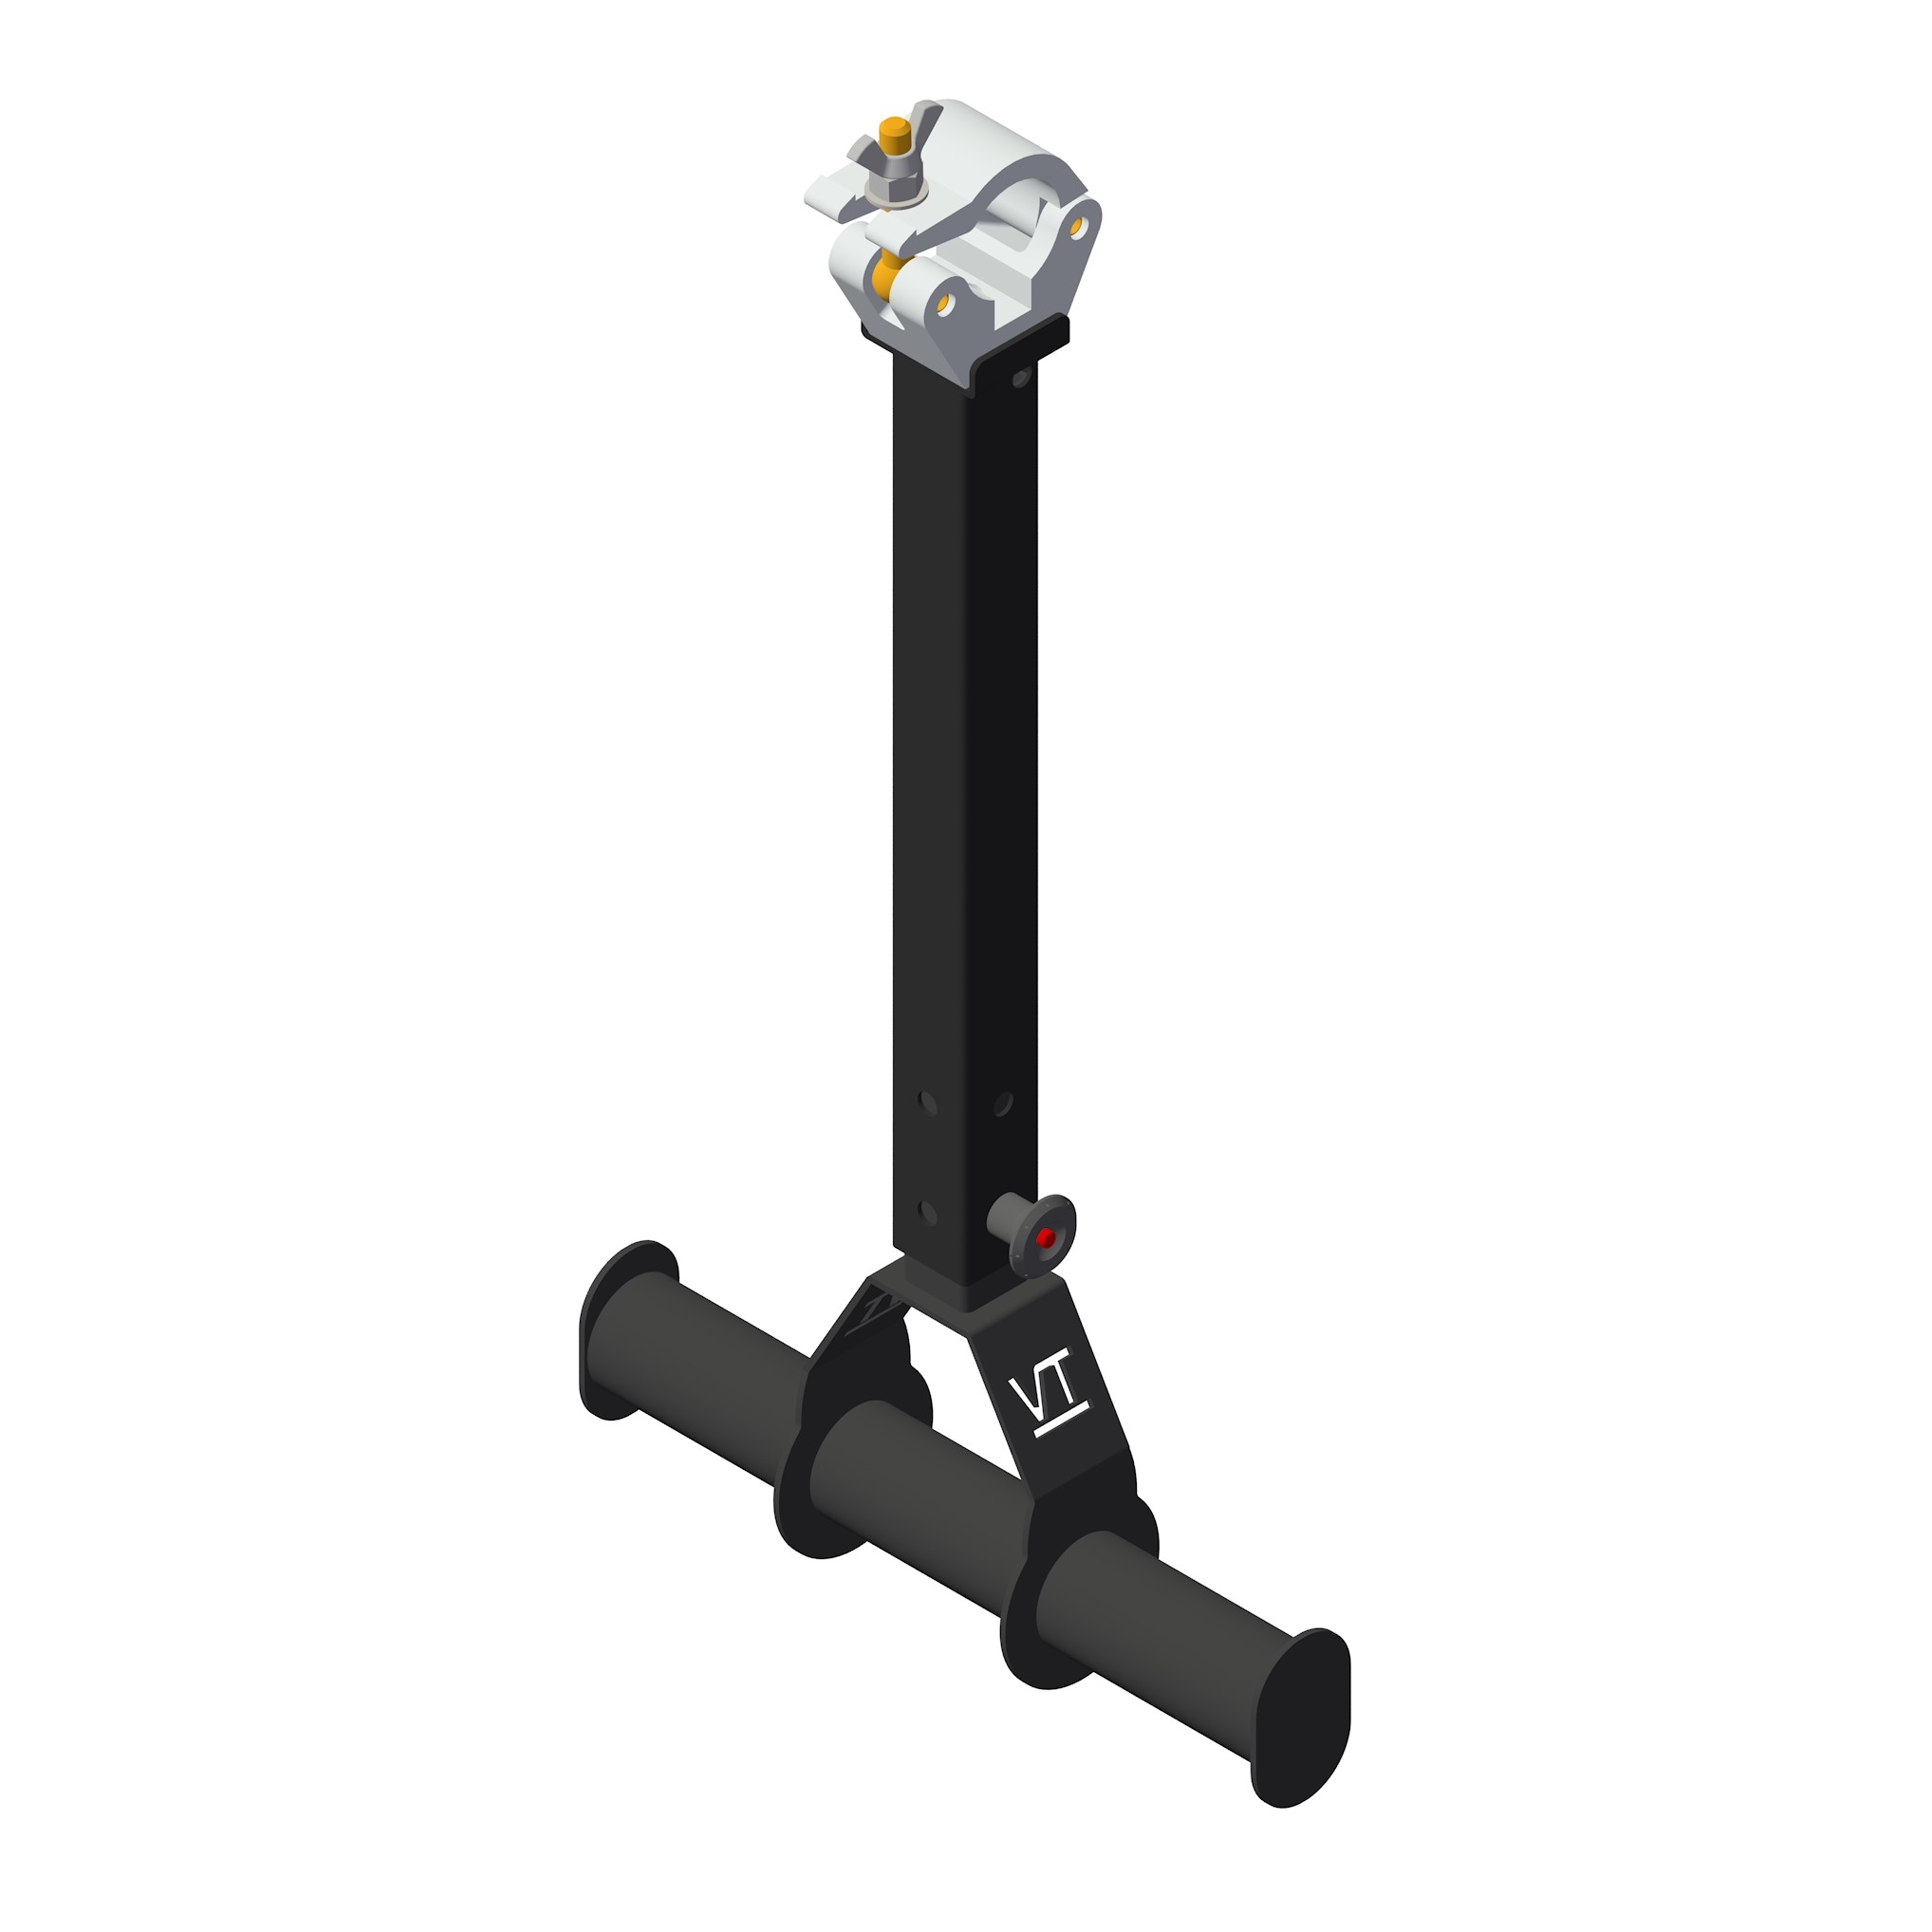 droparm downrigger verstelbaar telescoop